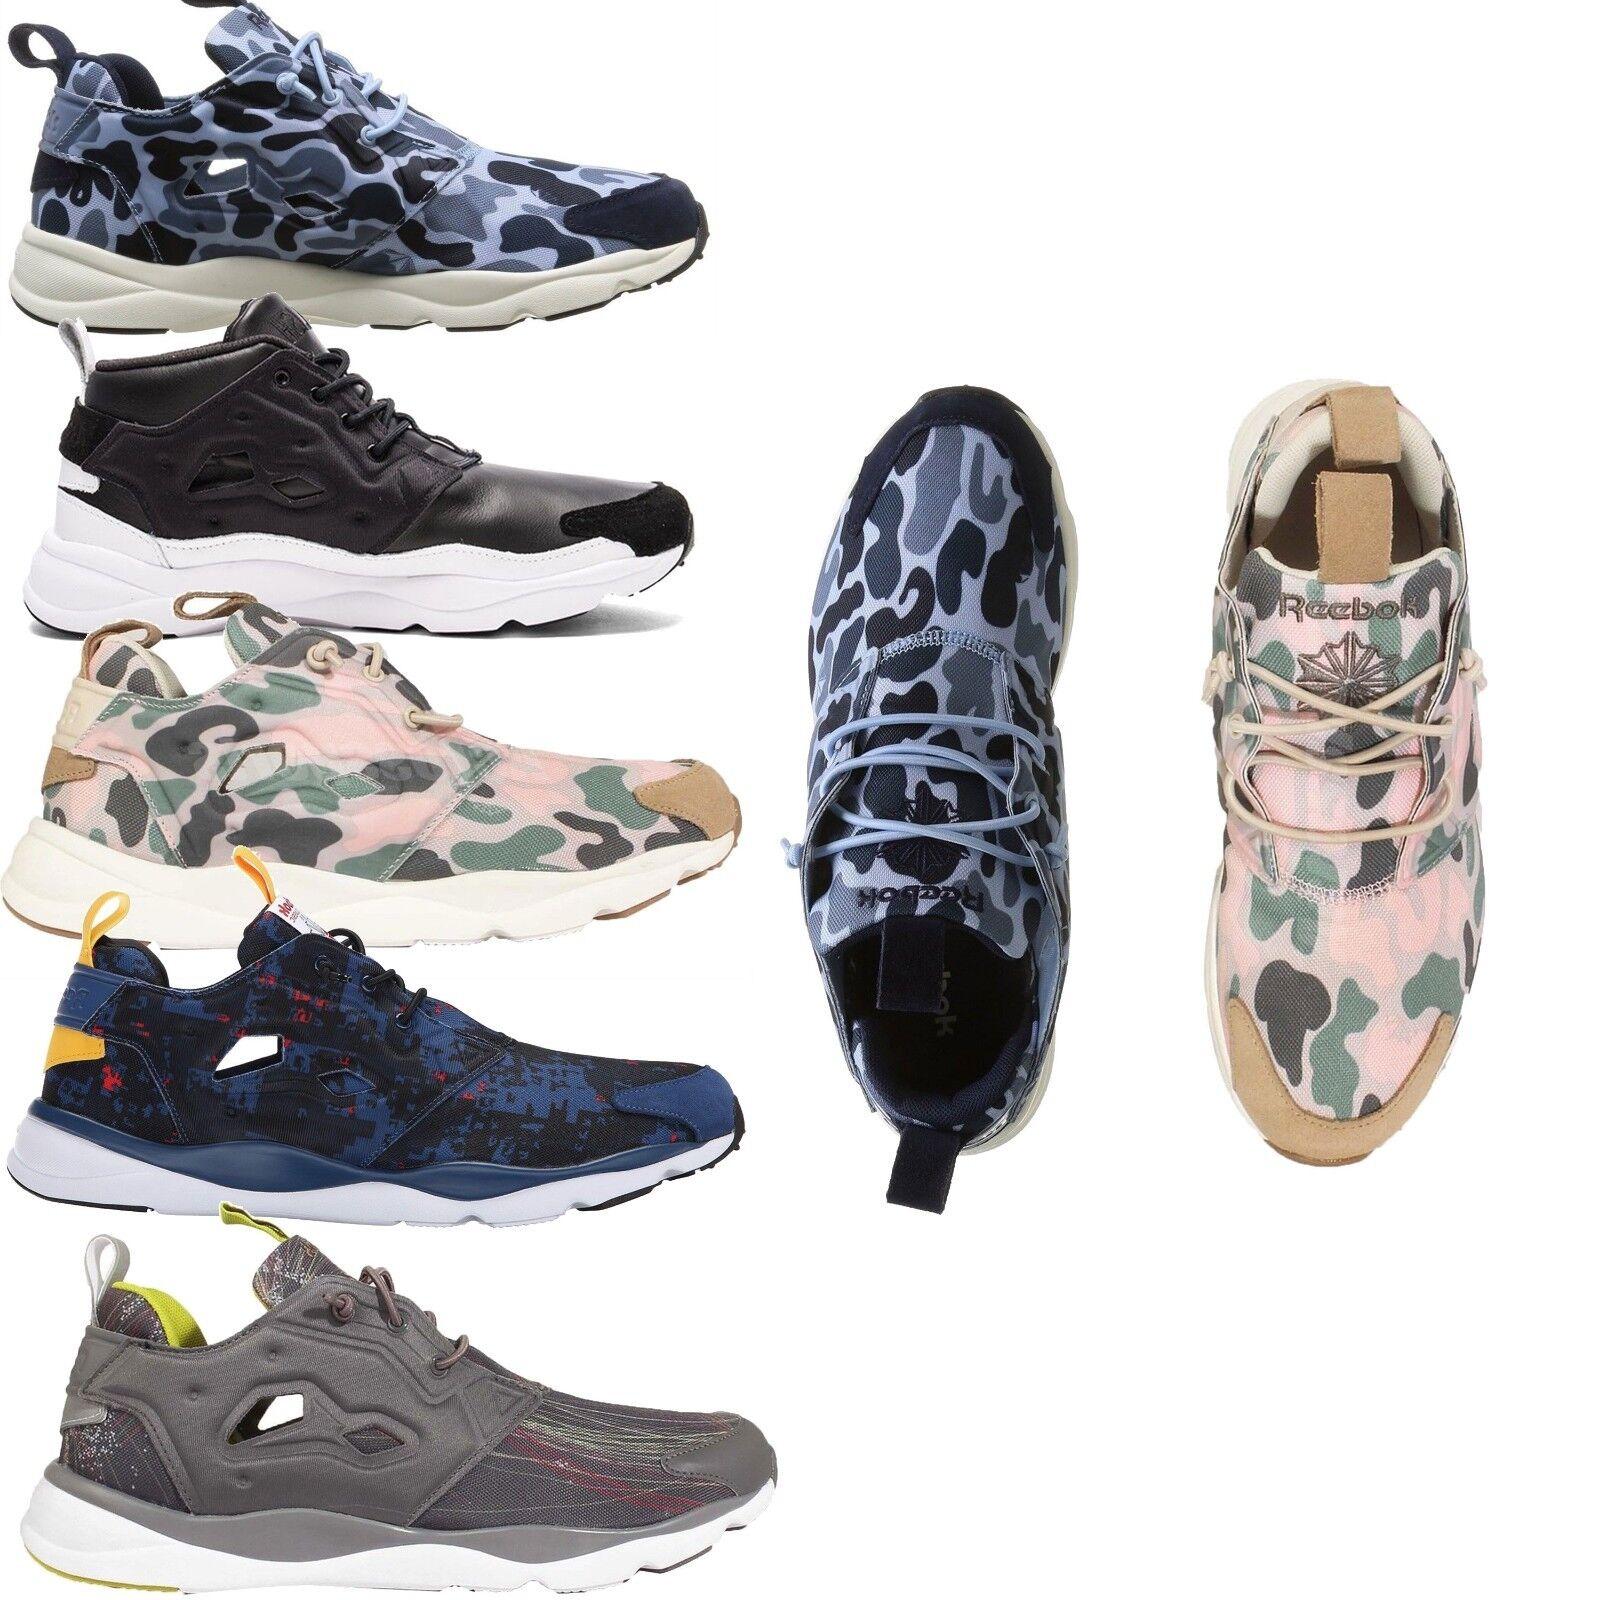 Reebok Classics Furylite Chukka So Men's Running Casual shoes Sneakers NEW